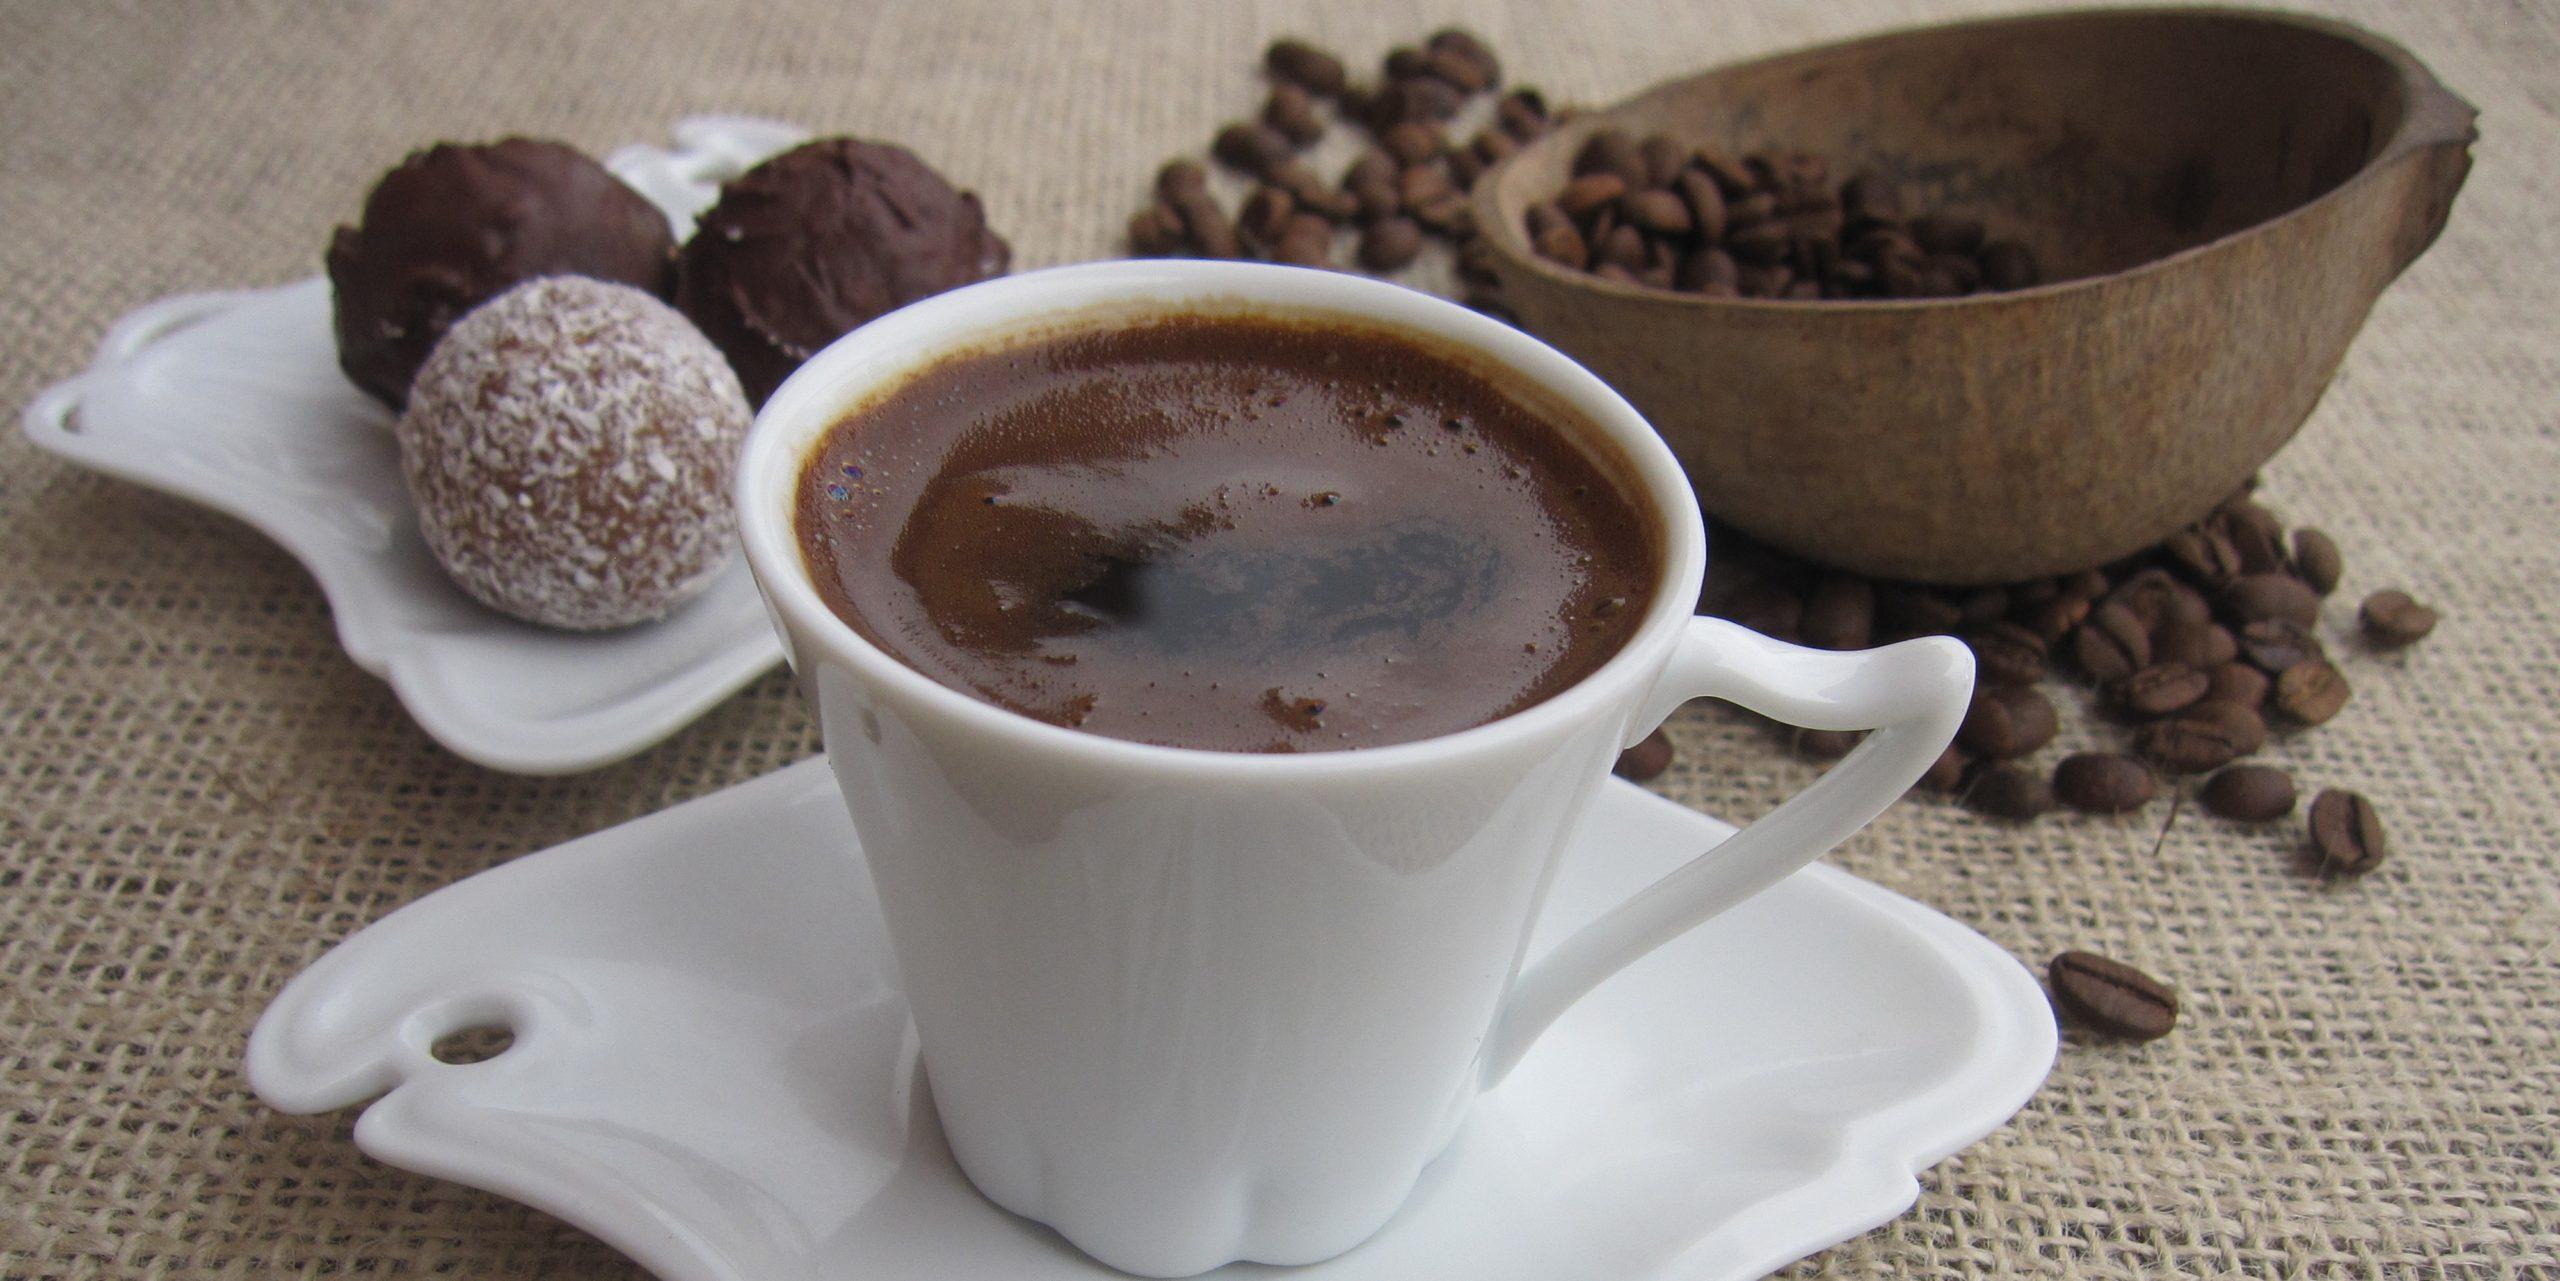 Kafe_turke-2.jpg